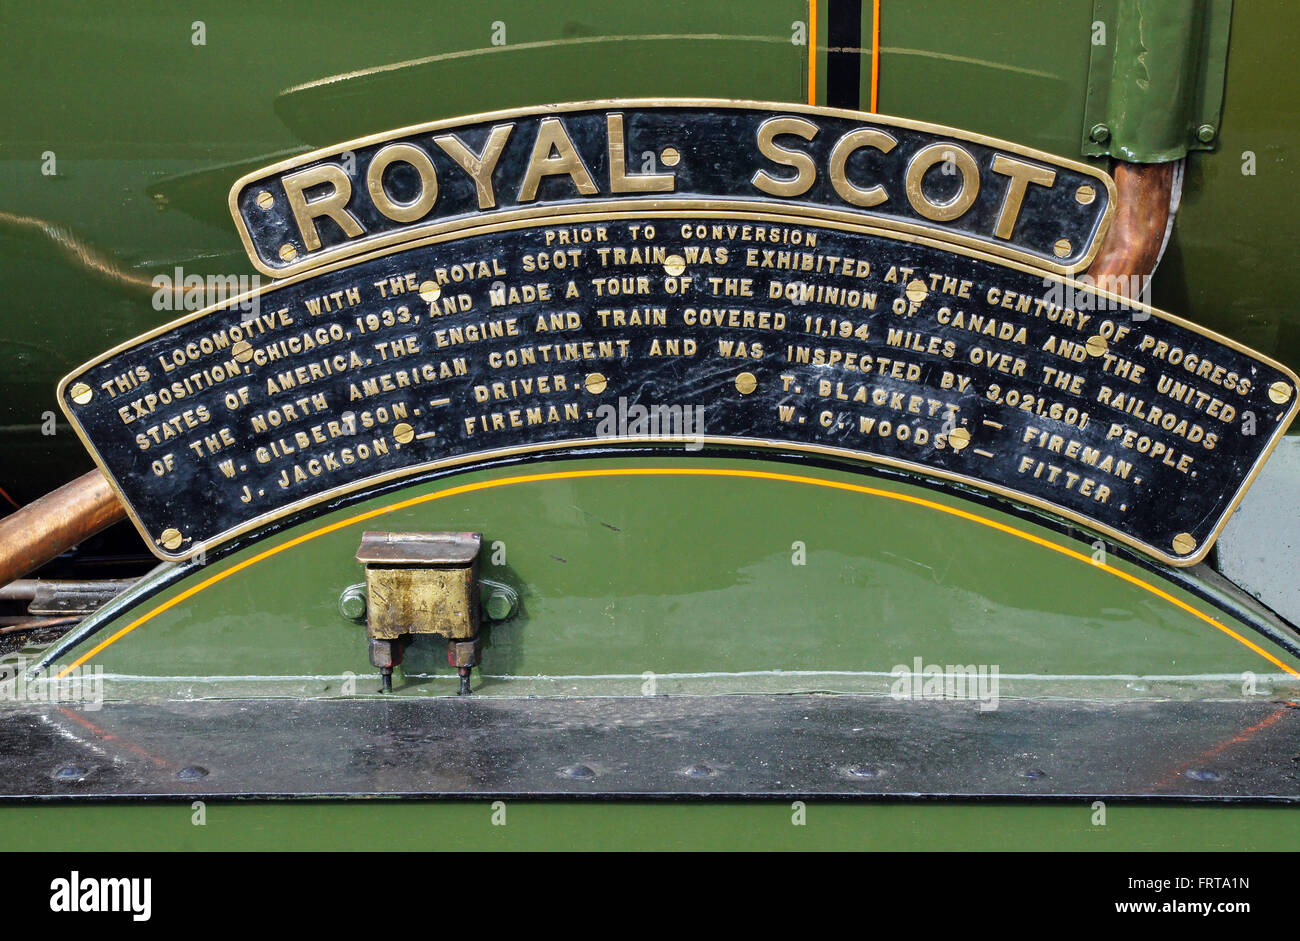 Name plate of 6100 Royal Scot - Stock Image